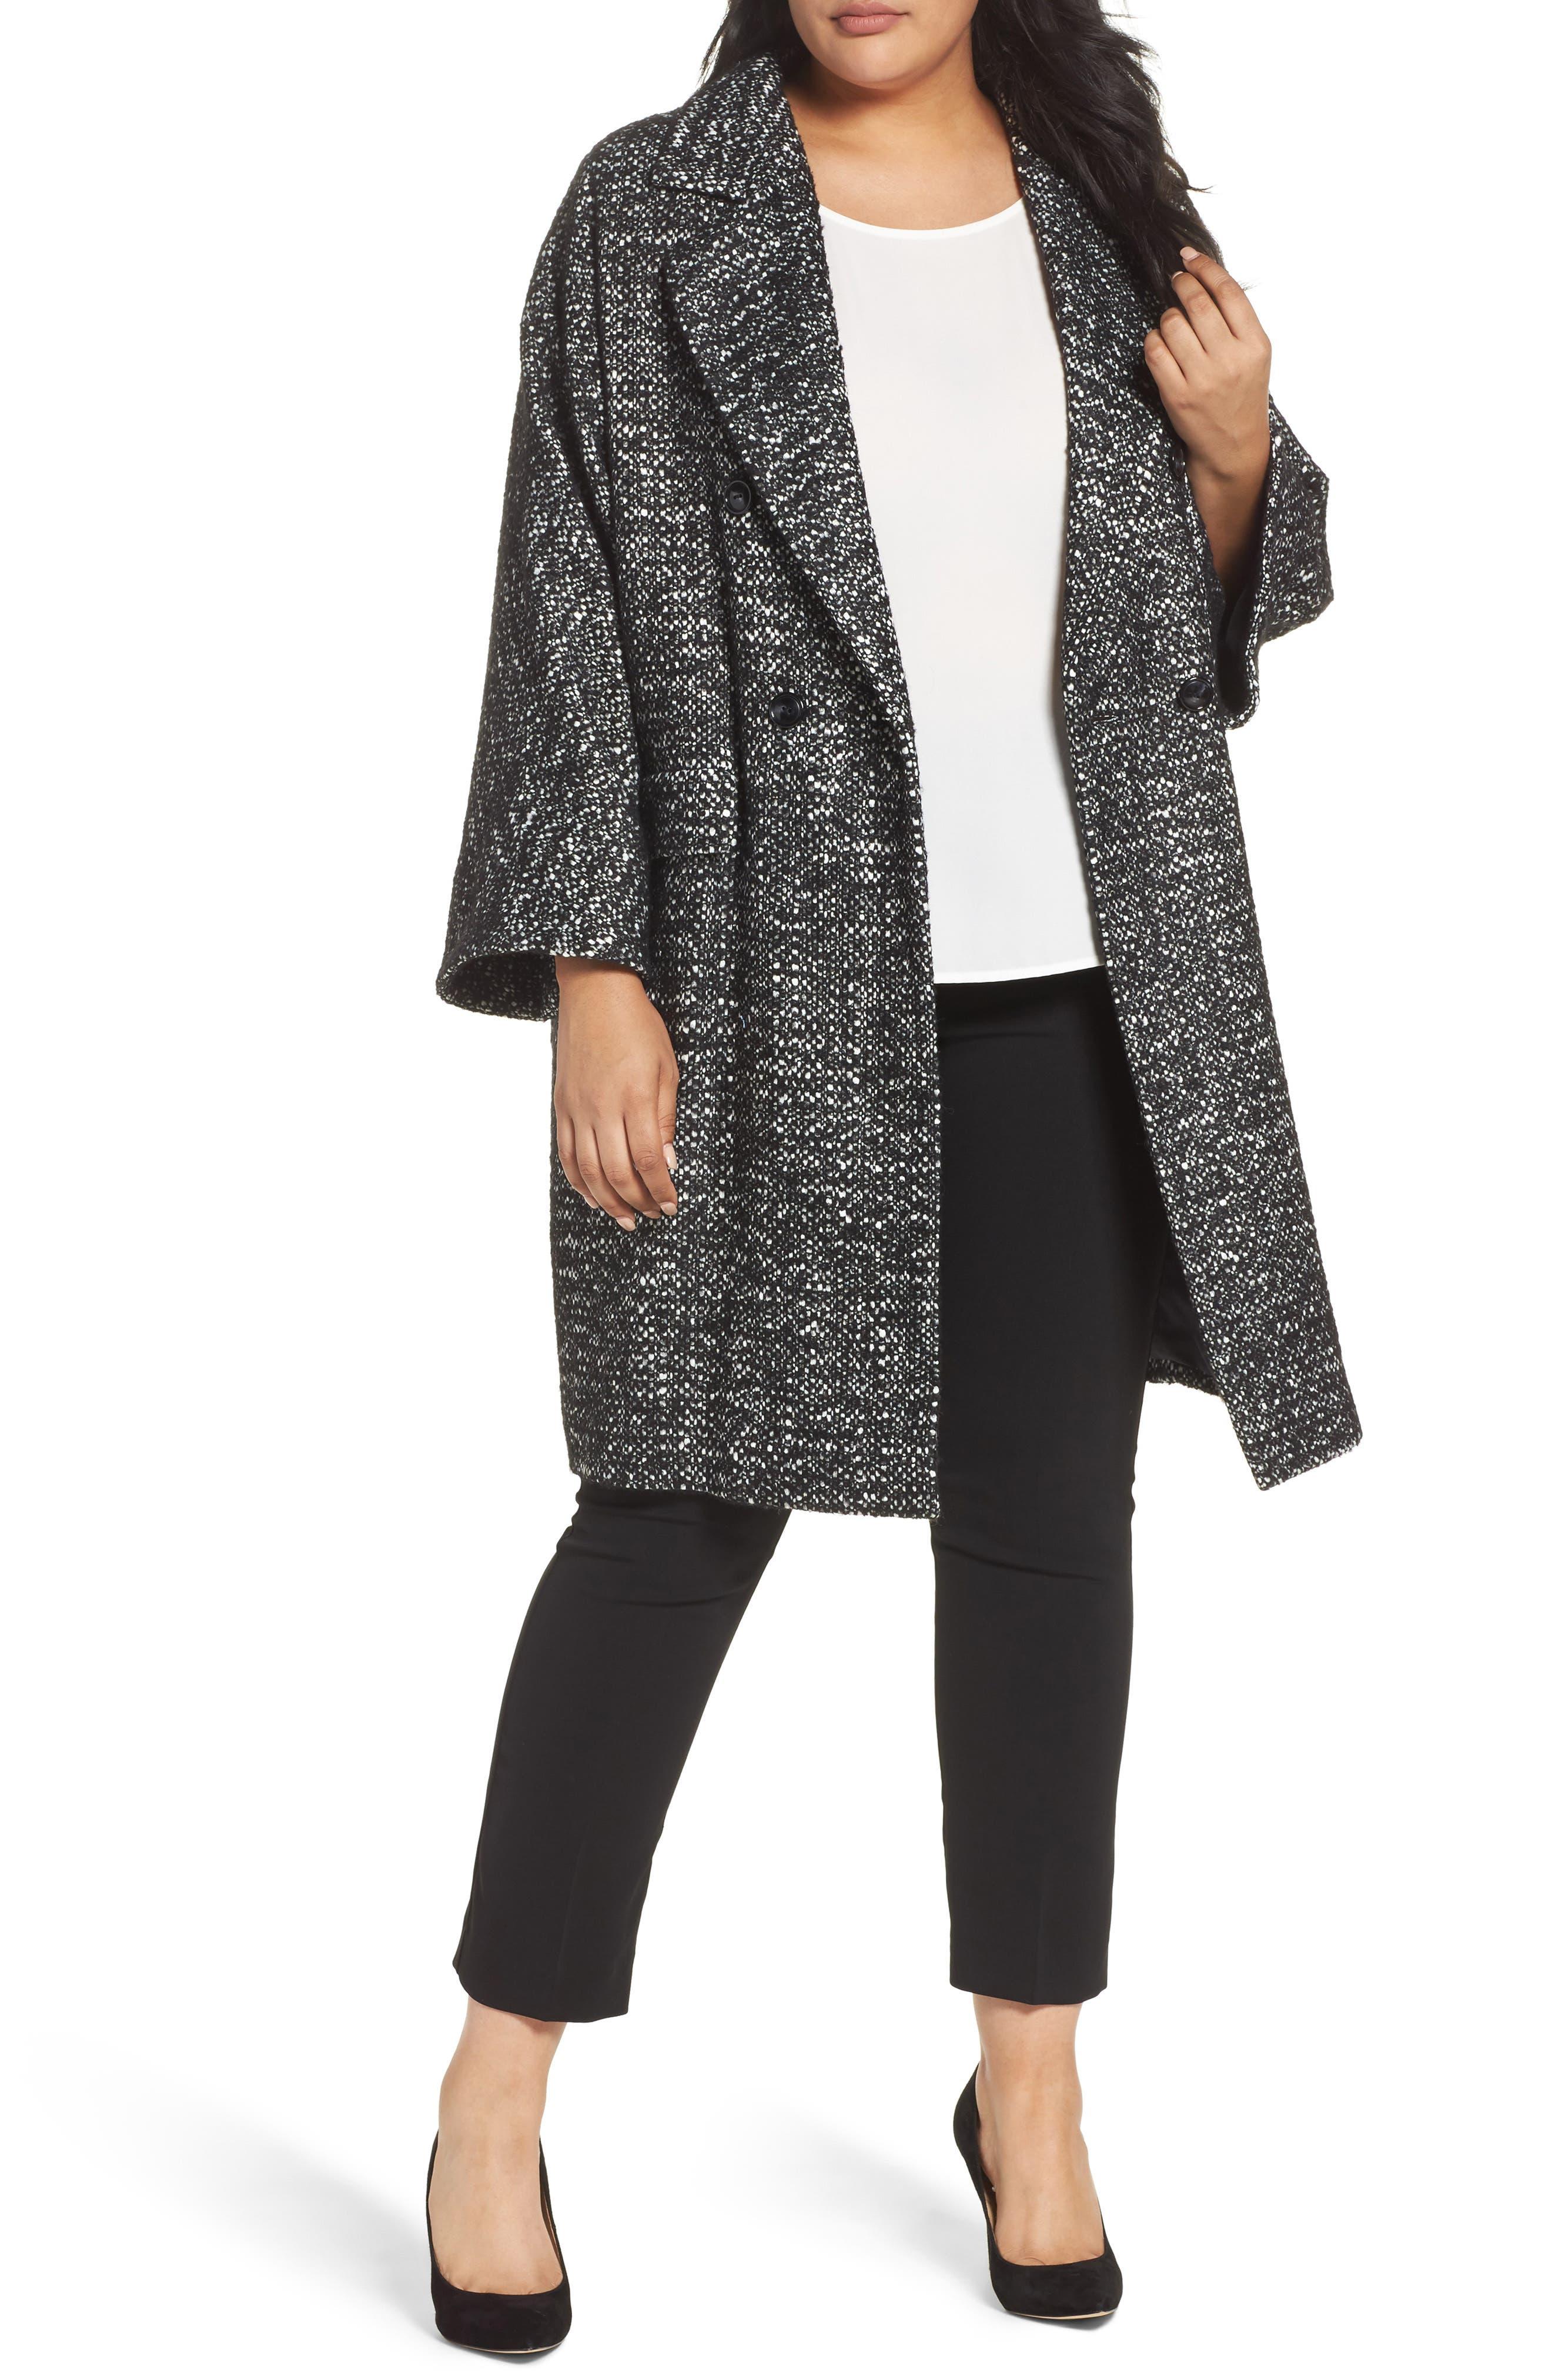 Main Image - Persona by Marina Rinaldi Tweed Car Coat (Plus Size)